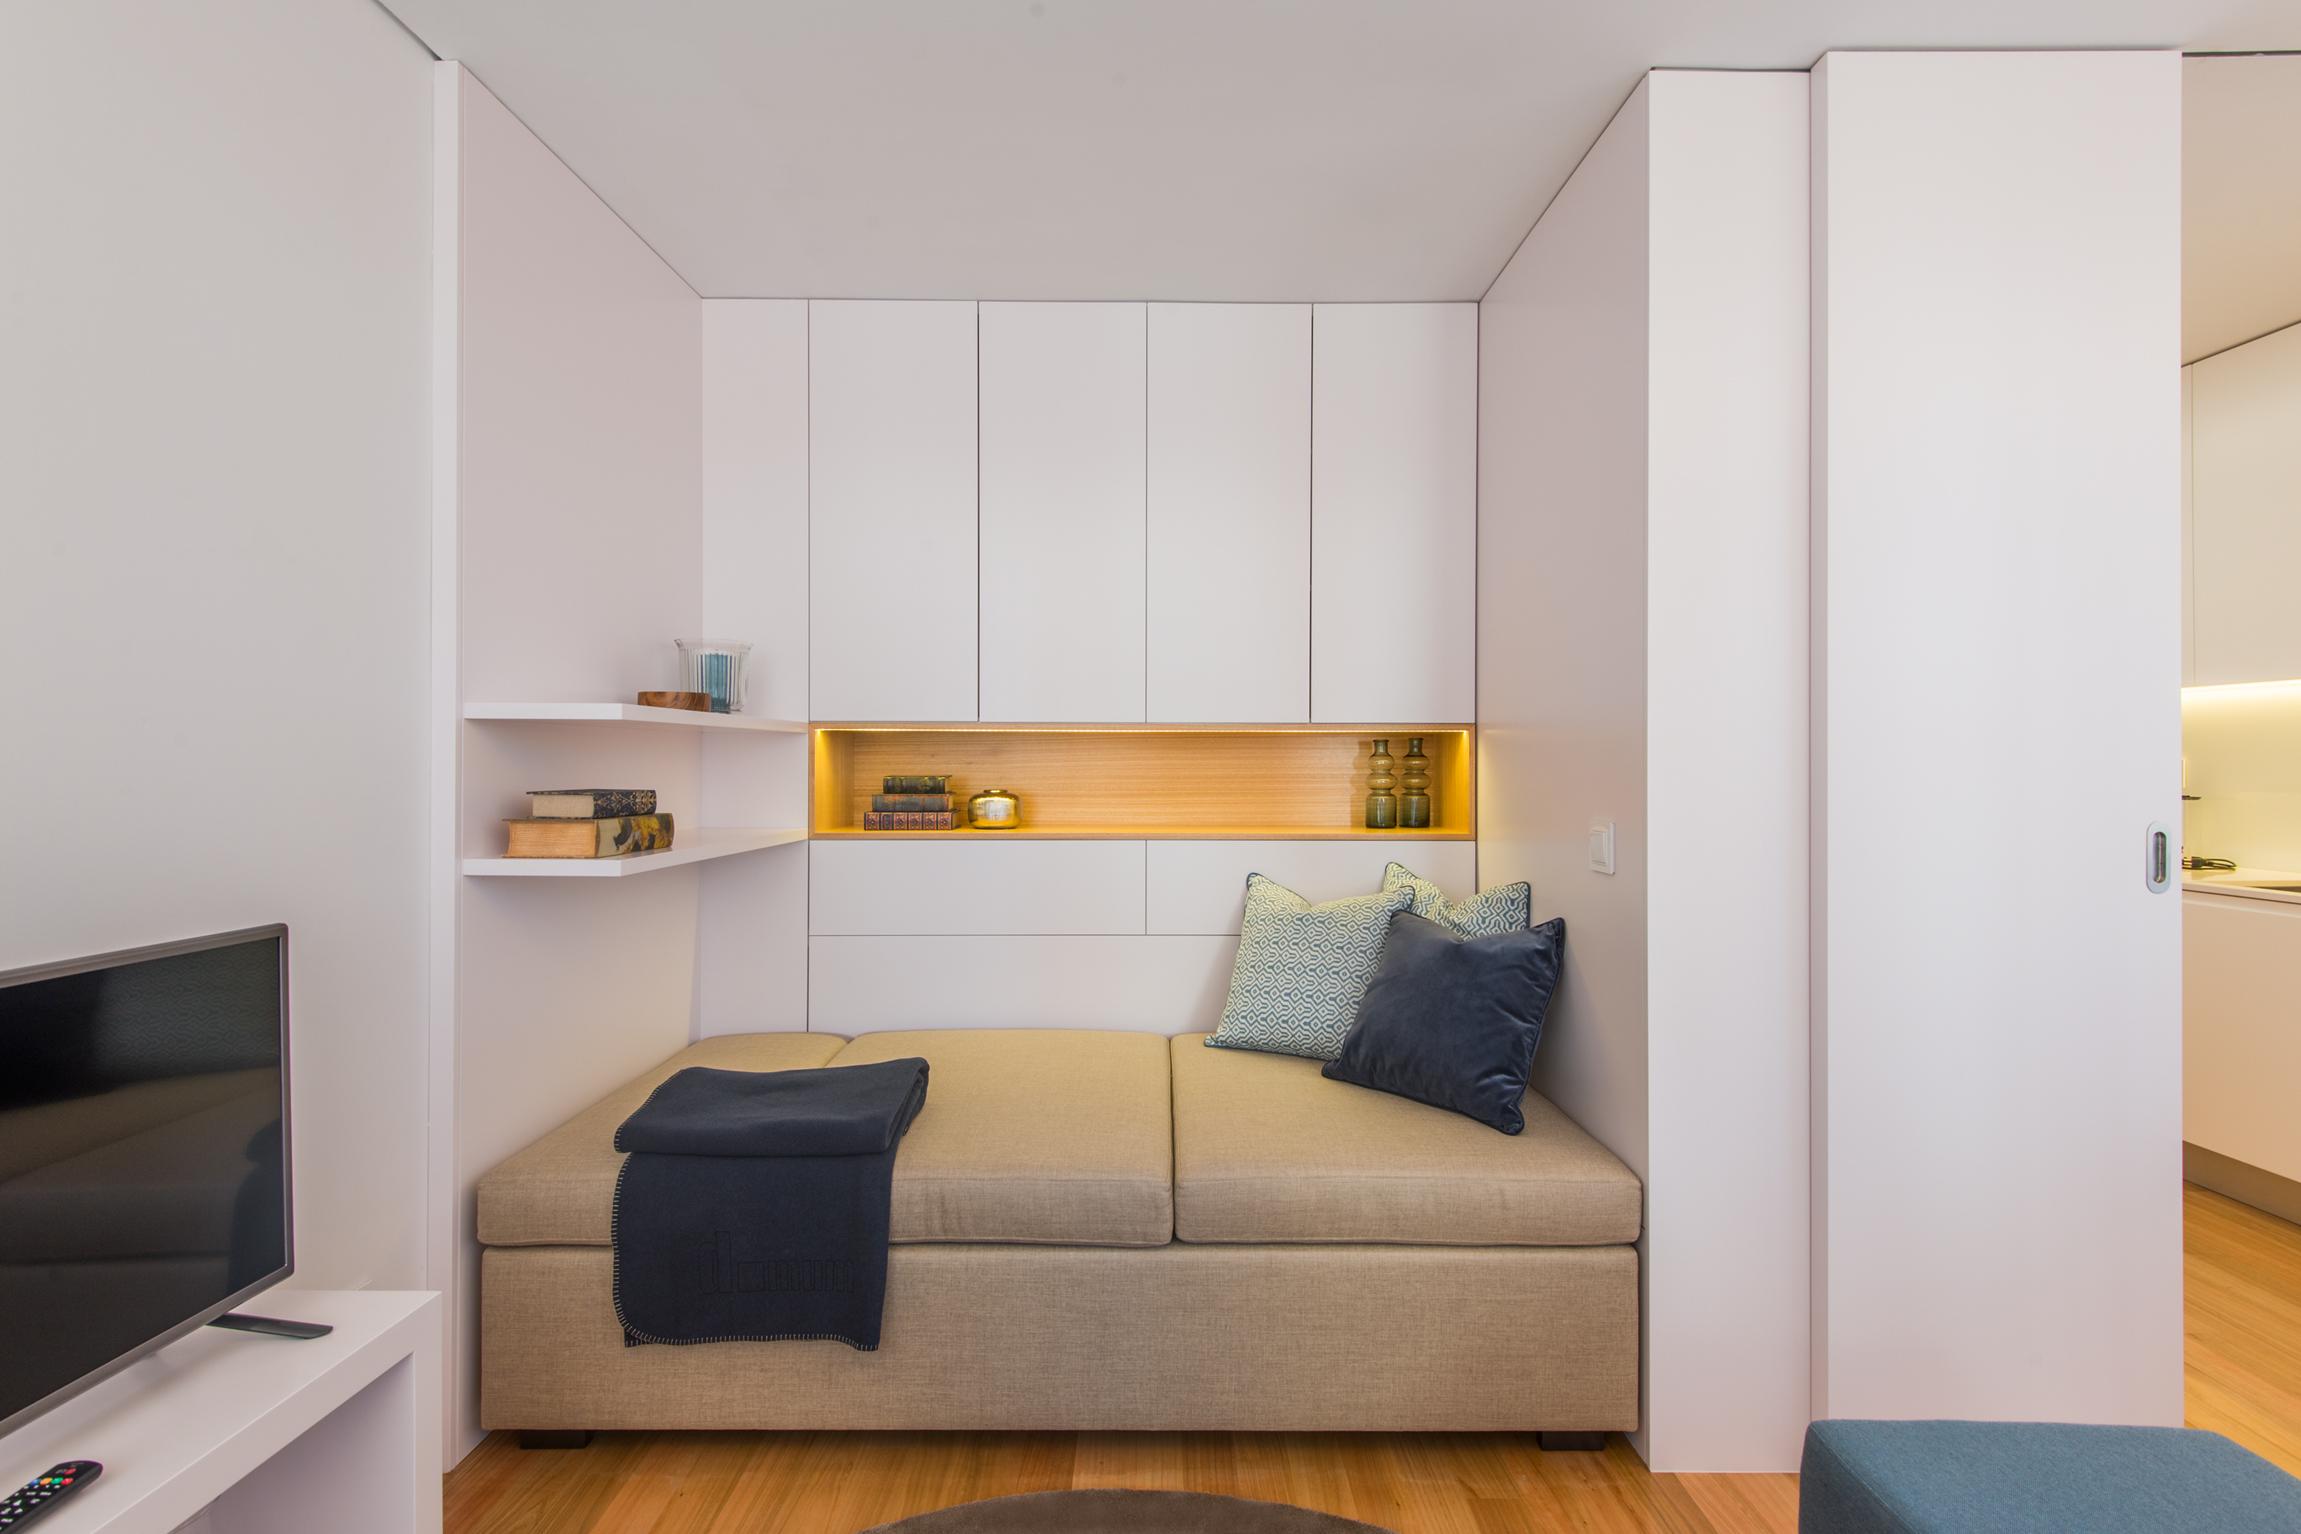 Sofá cama para aprovechar espacio